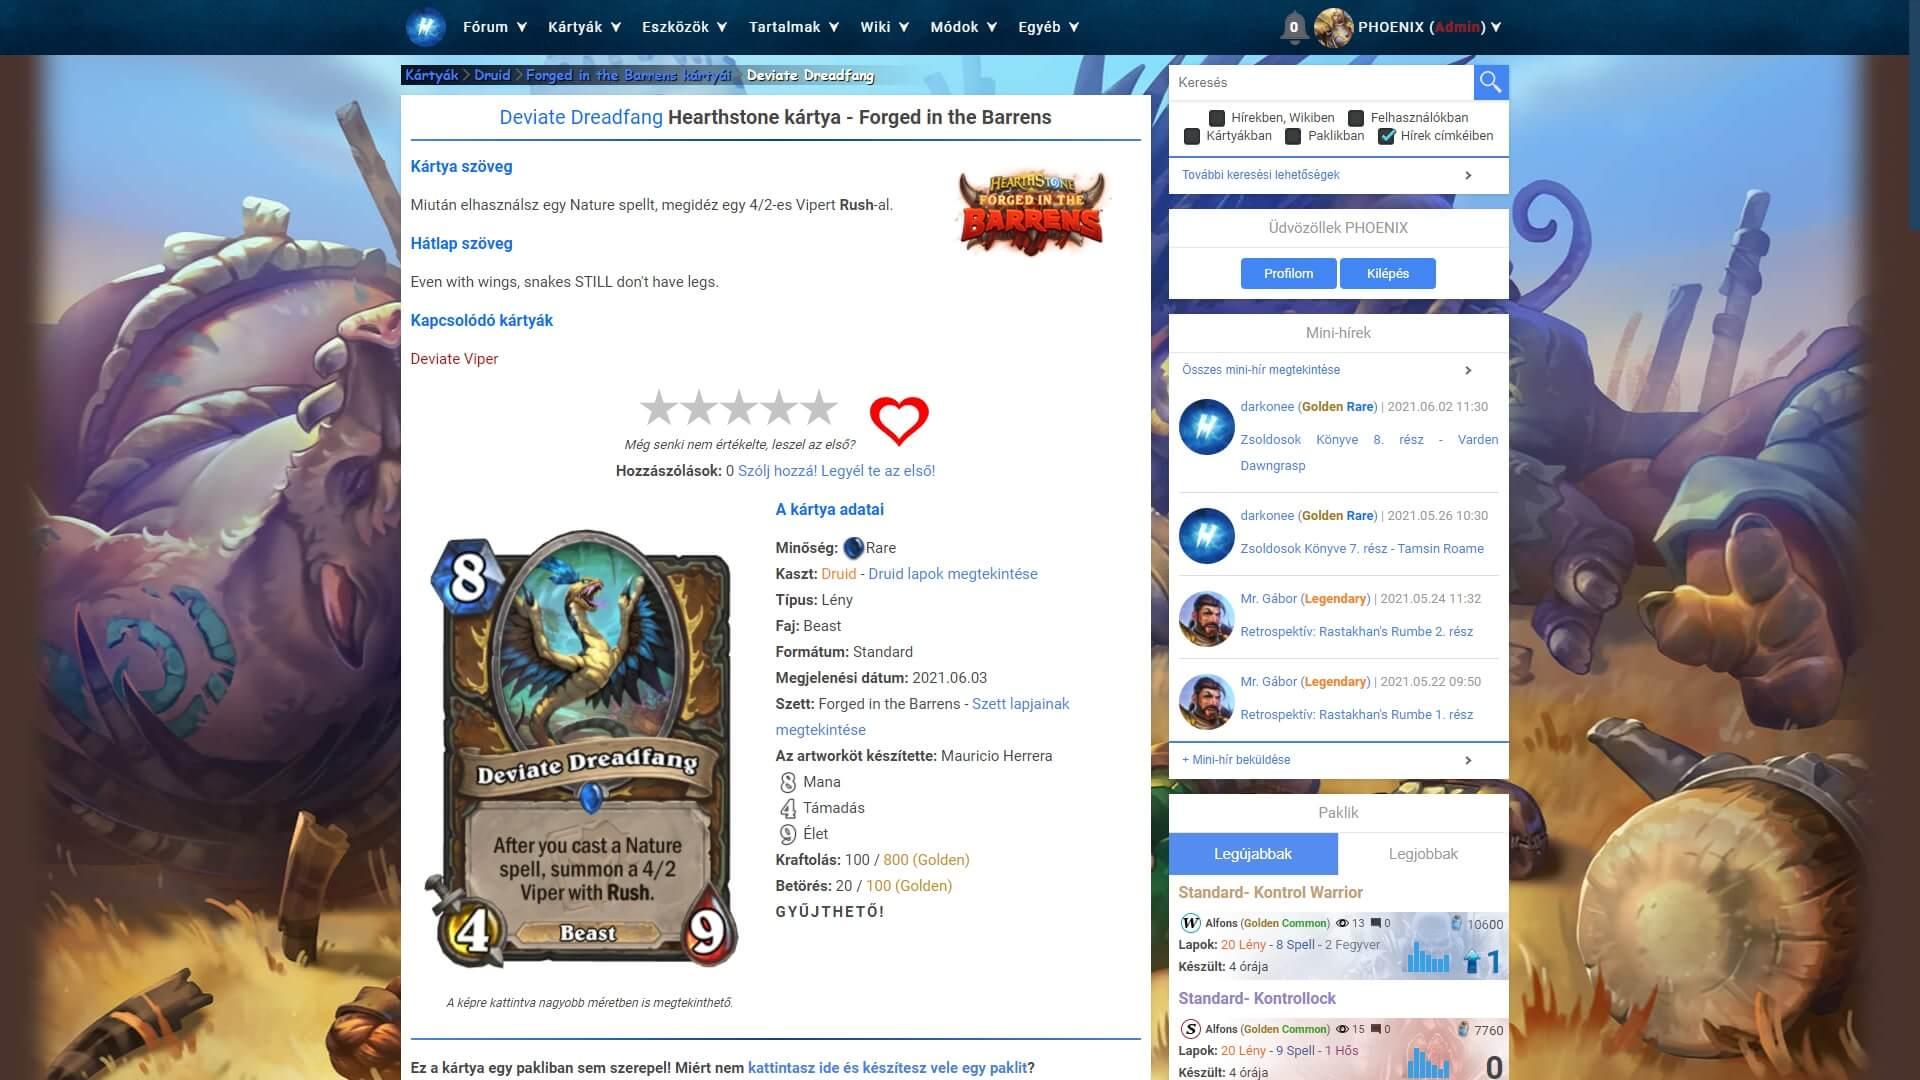 Deviate Dreadfang Hearthstone kártya